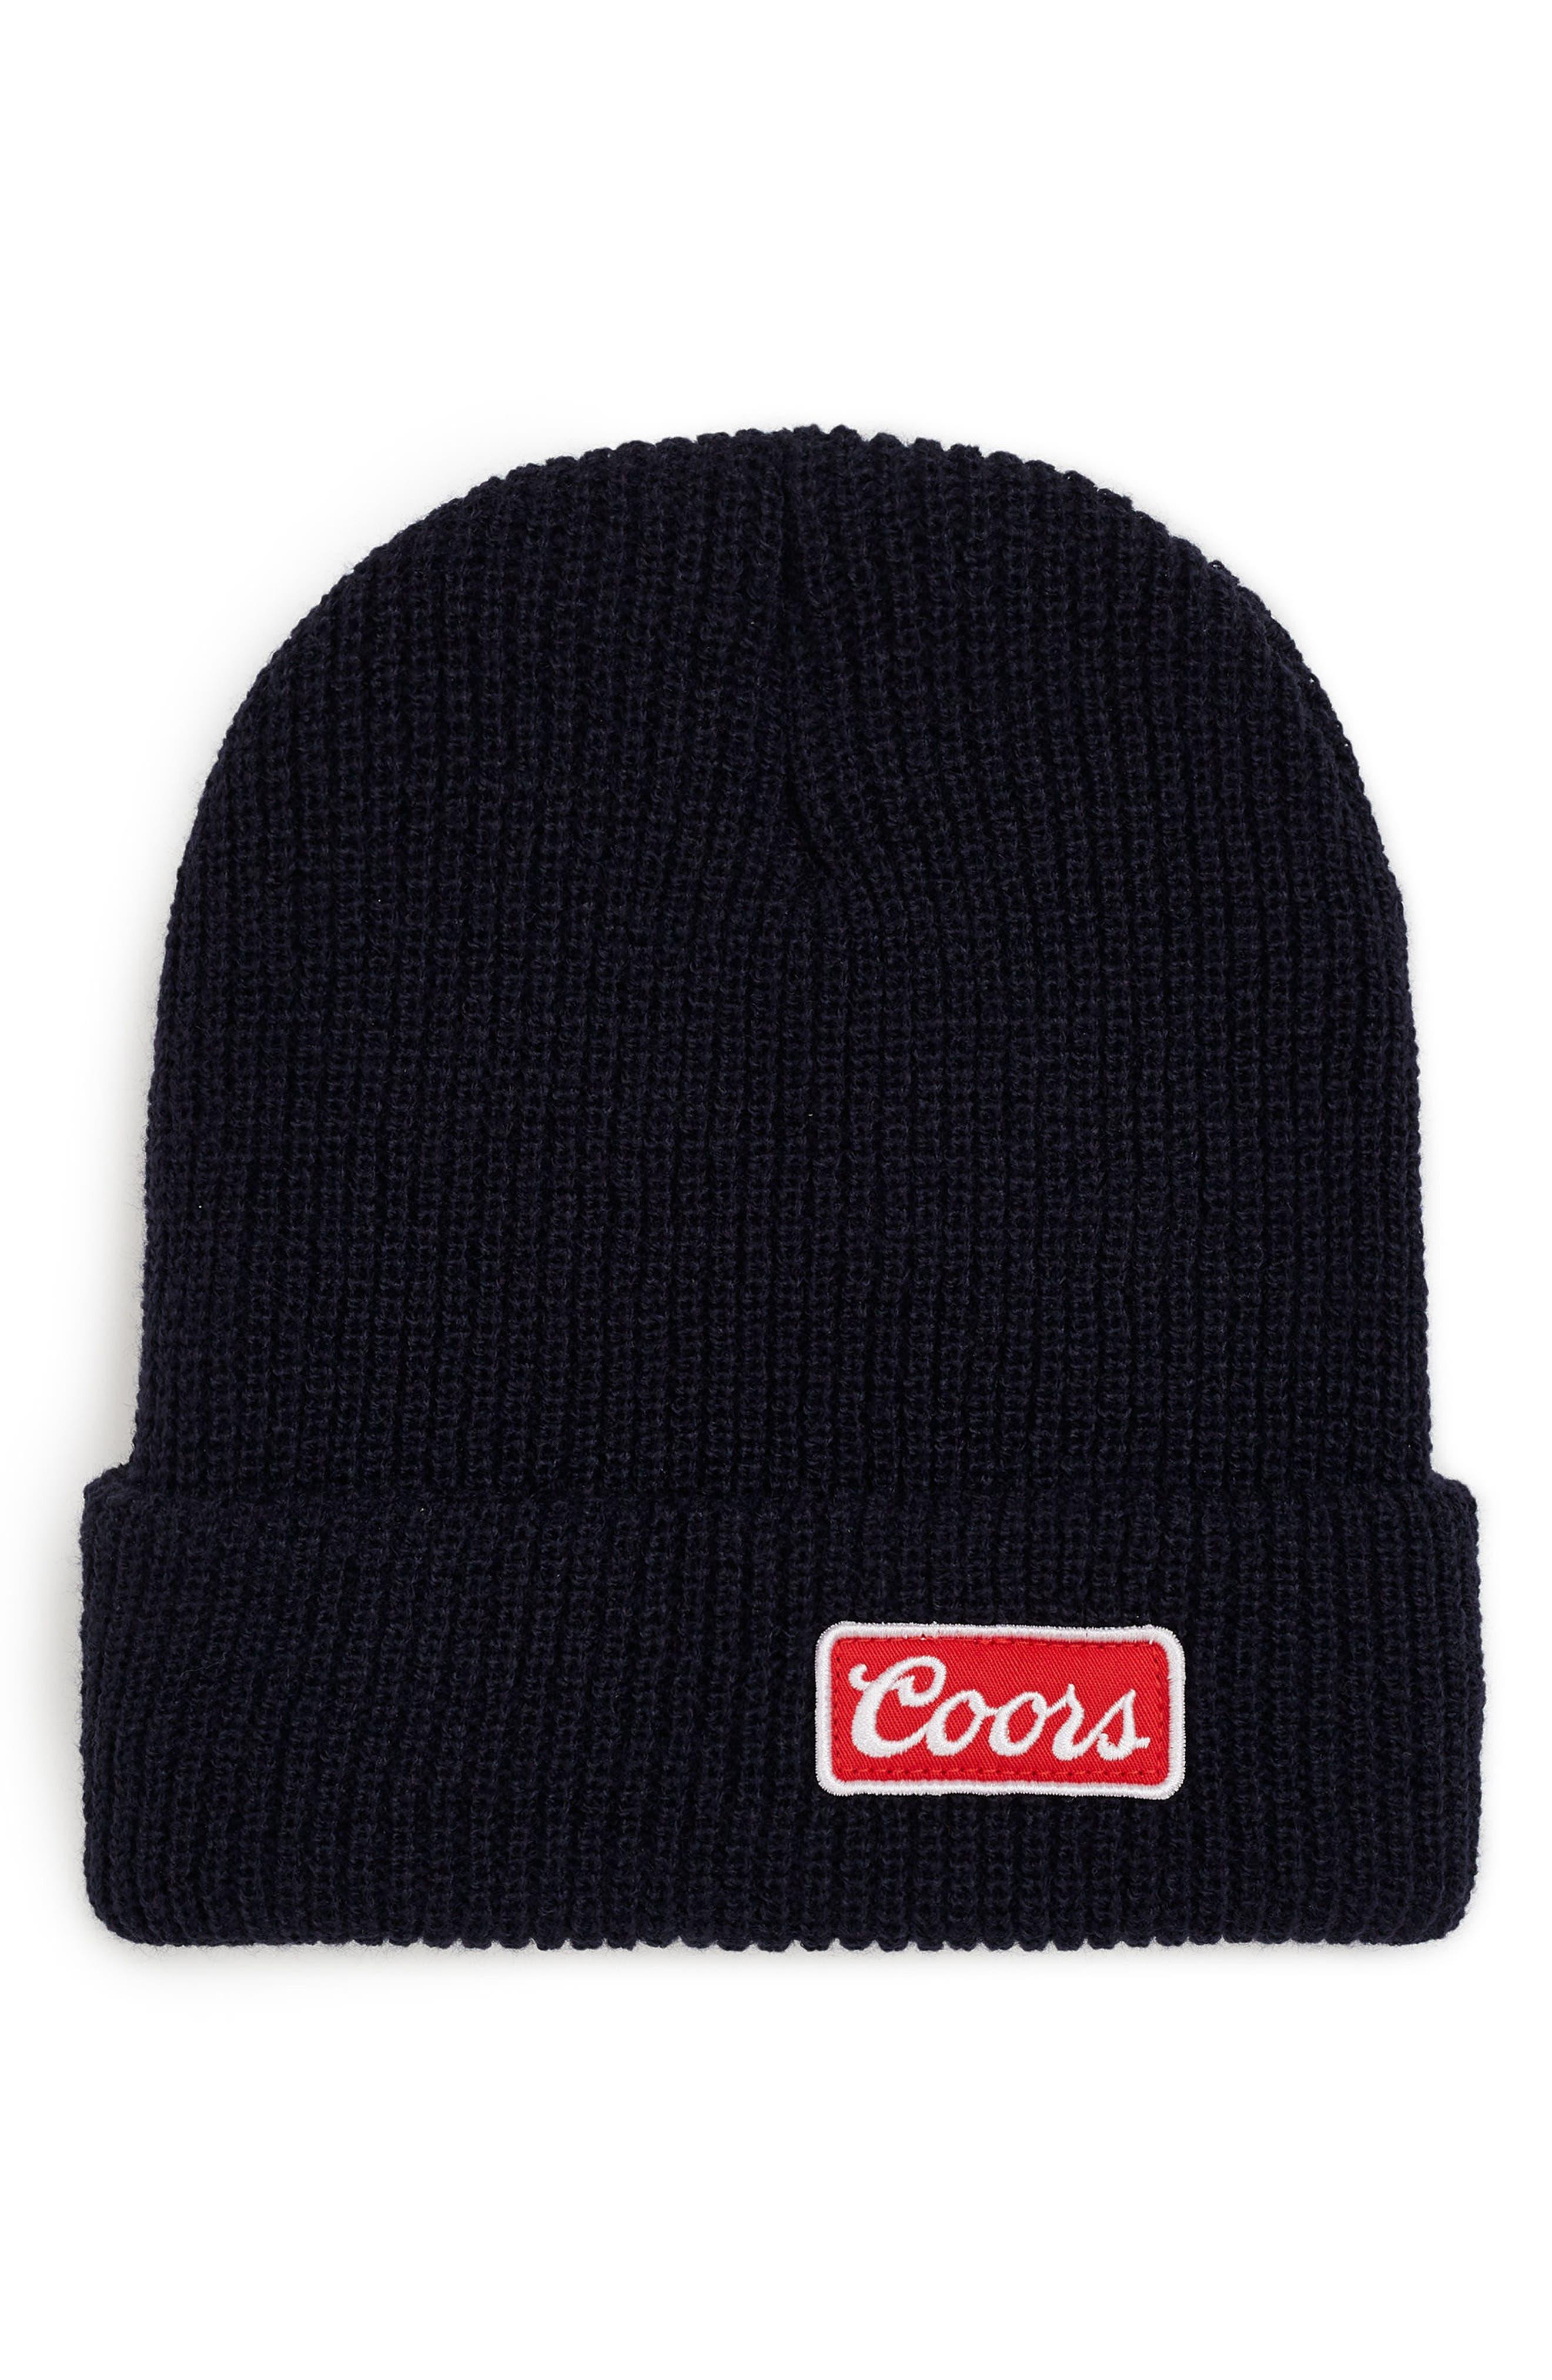 Brixton Coors Rib Knit Cap